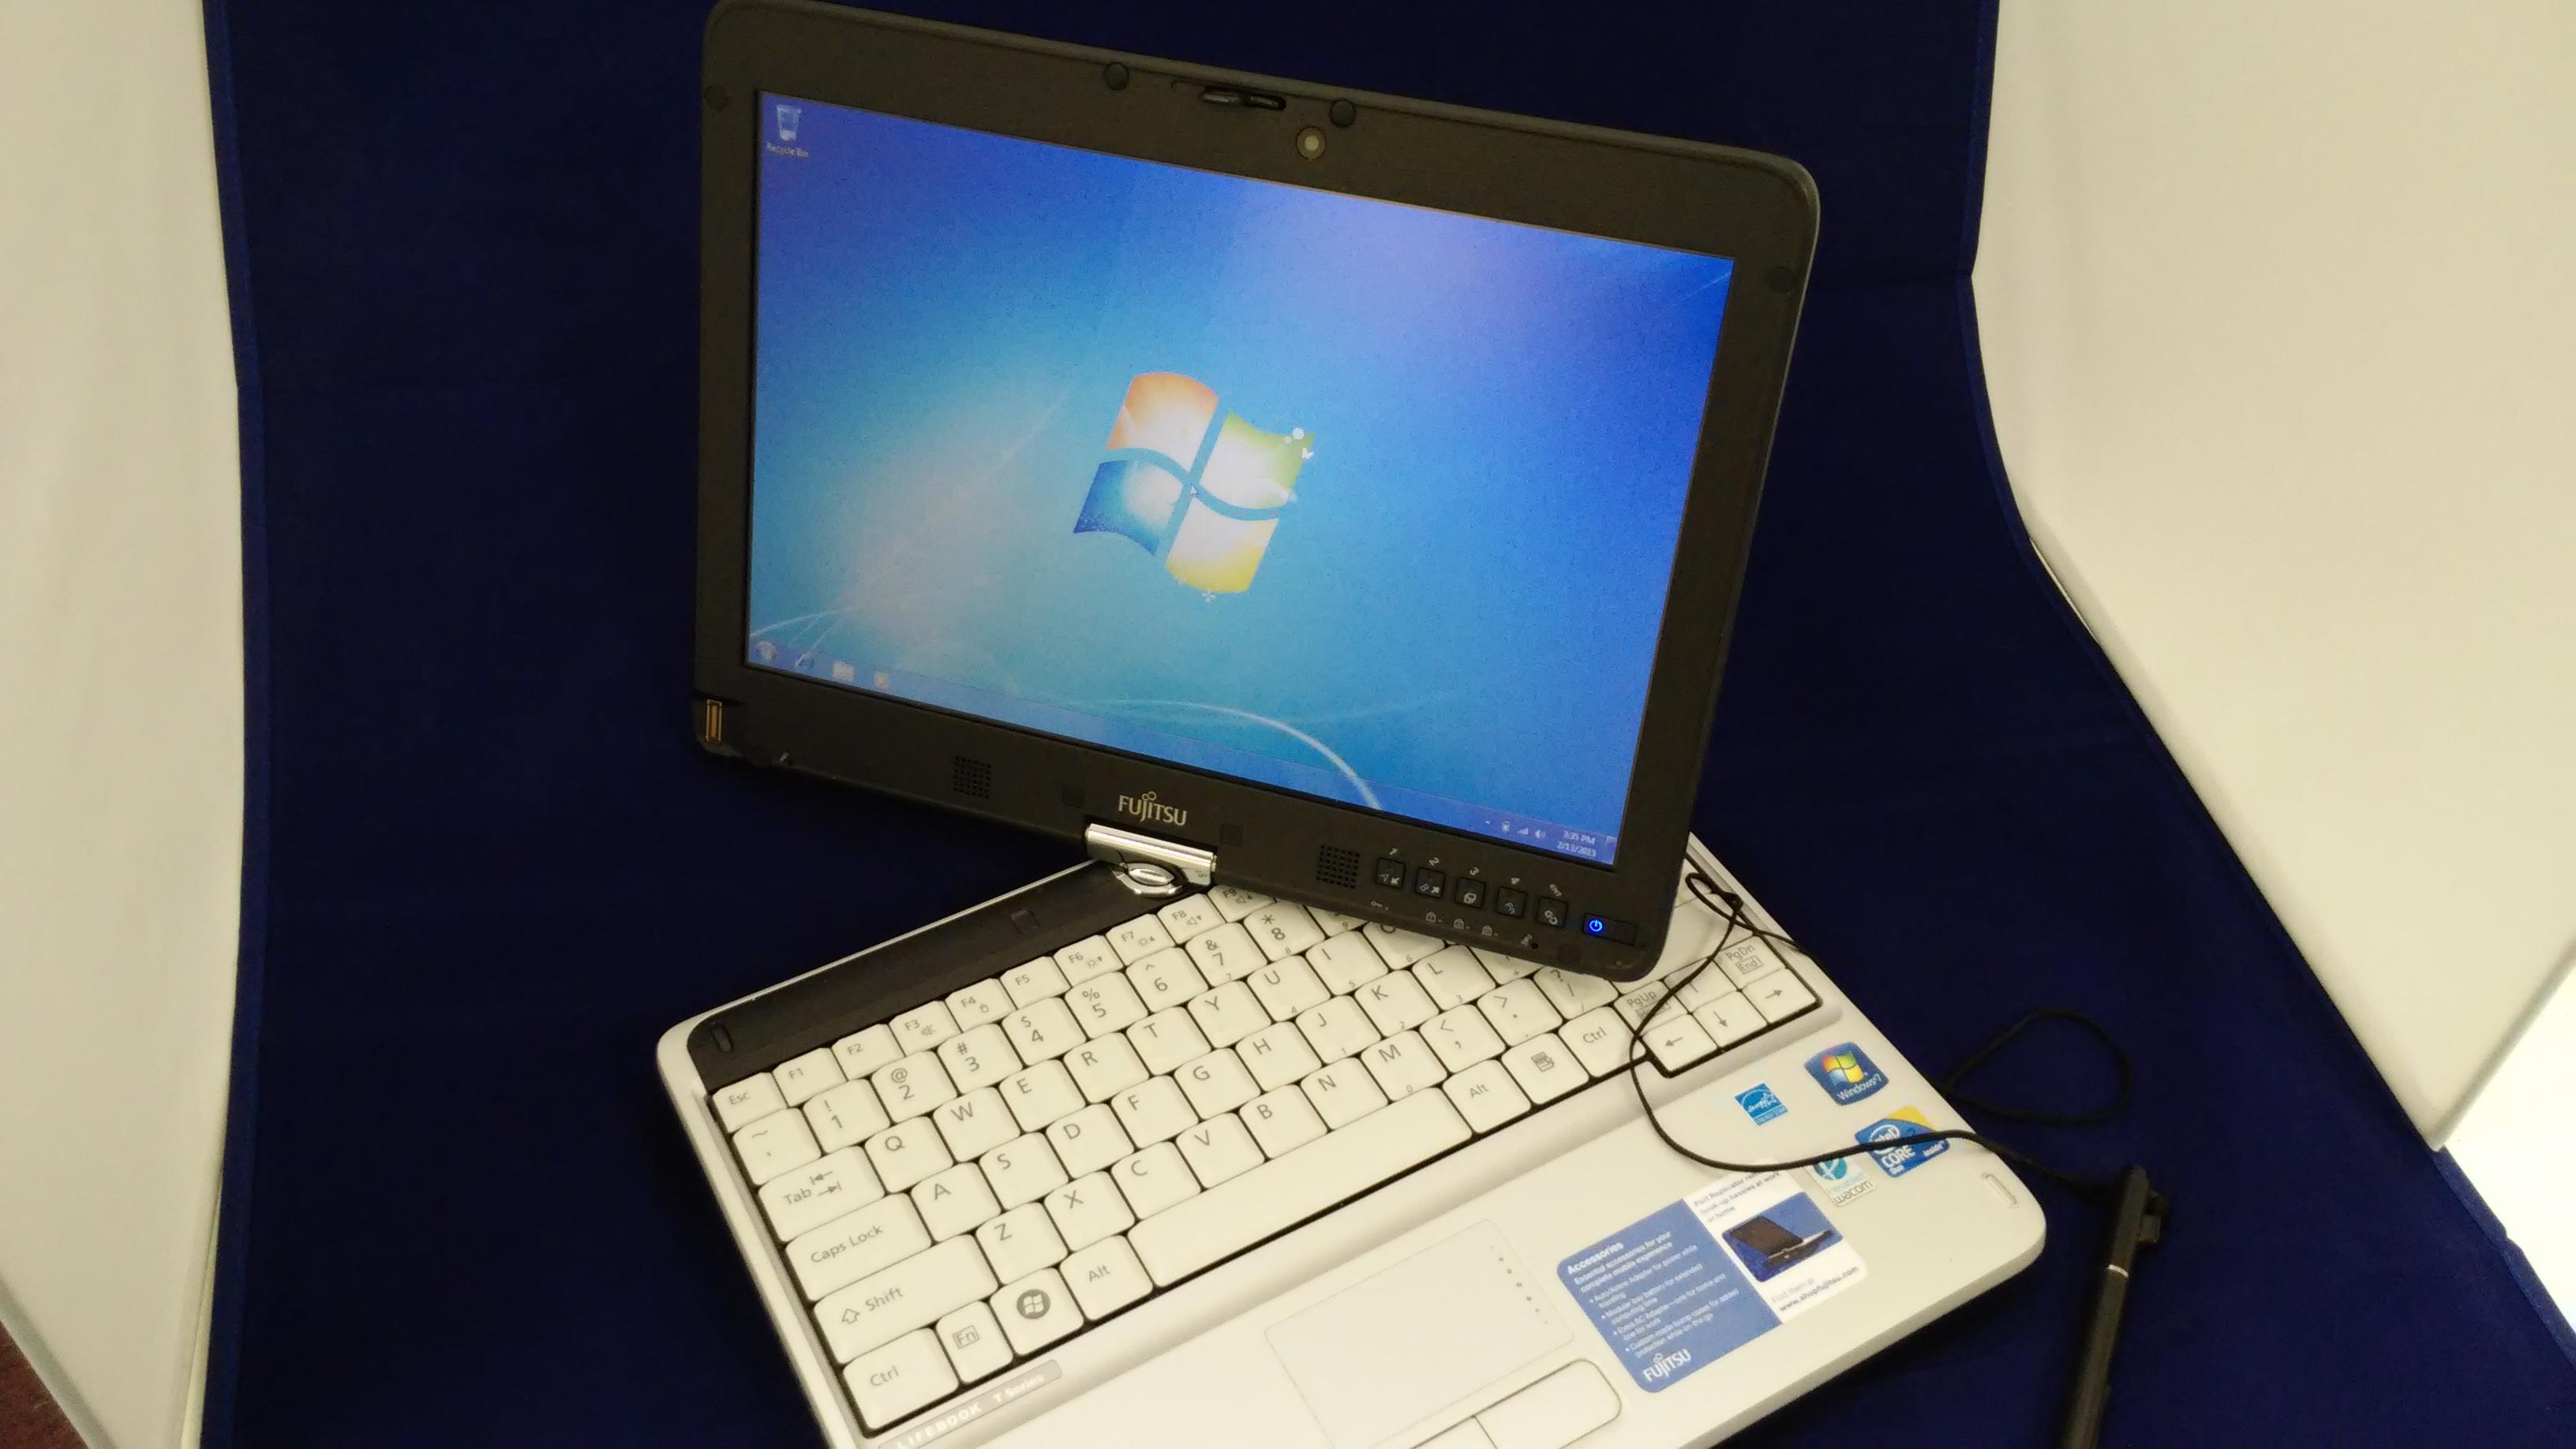 Fujitsu LifeBook Touchscreen T900 – 13 3 – Refurbished   Refurble